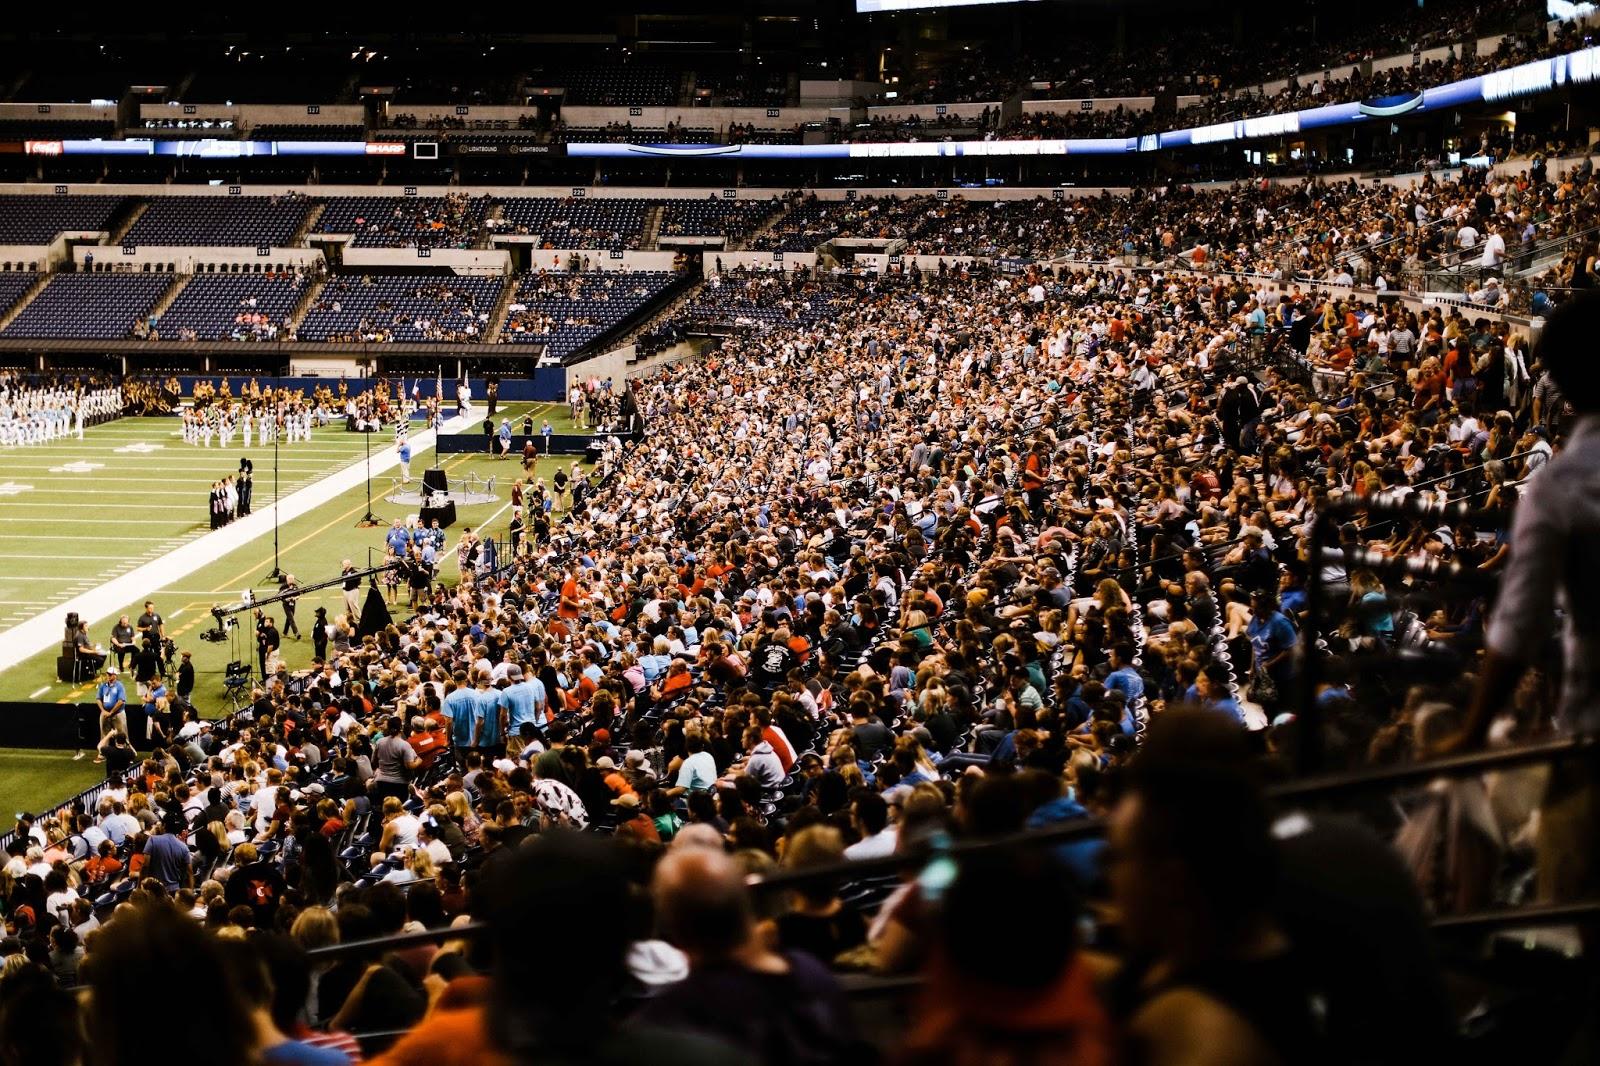 Crowds fill Lucas Oil Stadium at DCI World Finals